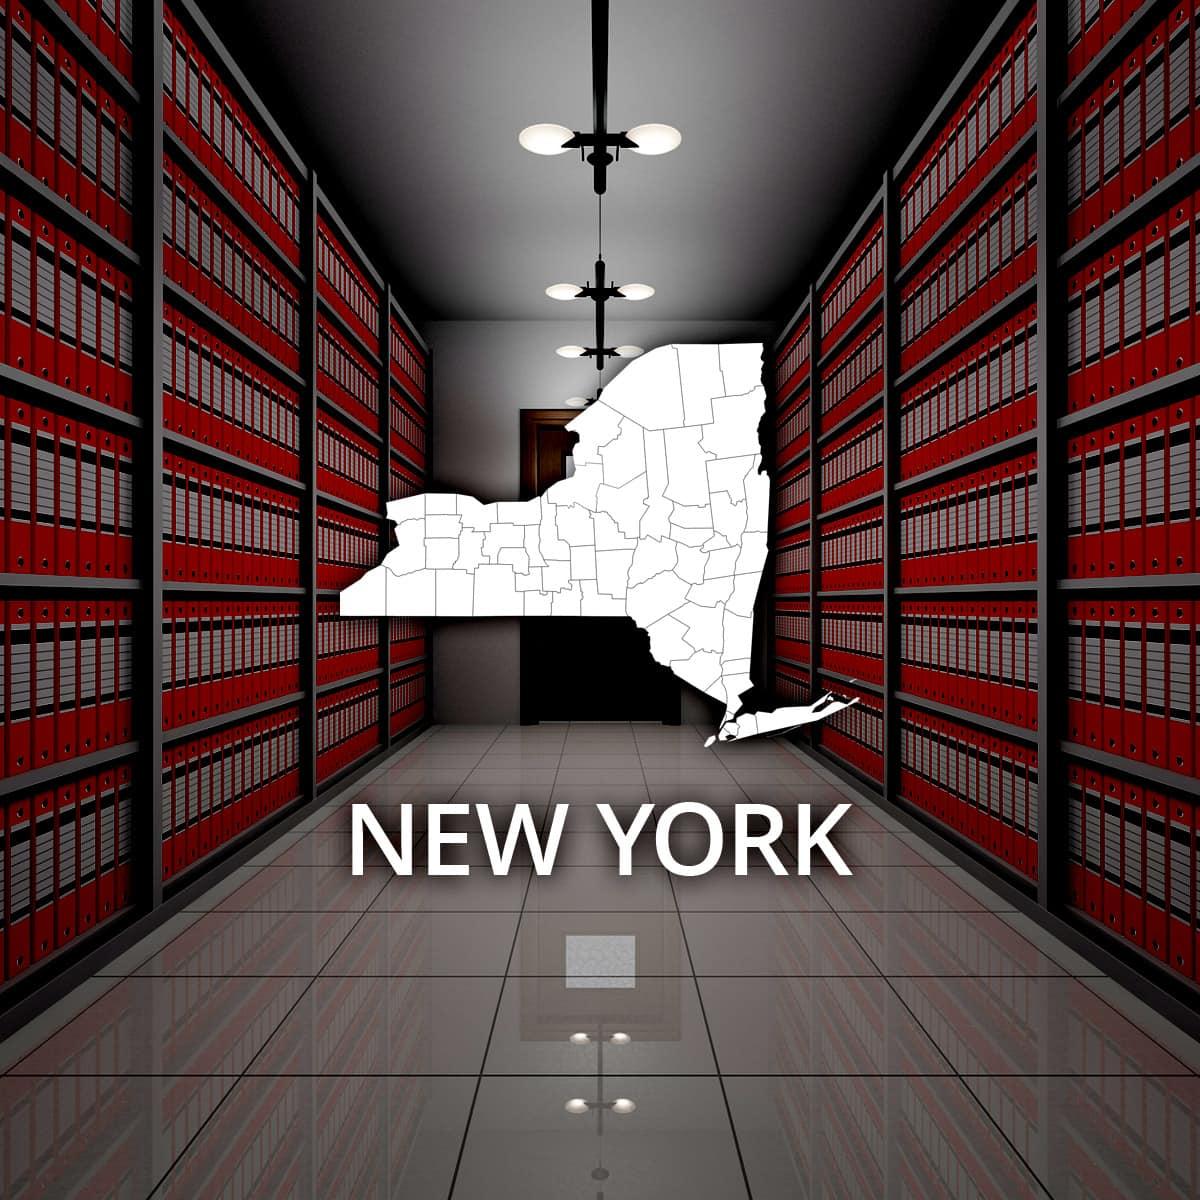 New York Public Records